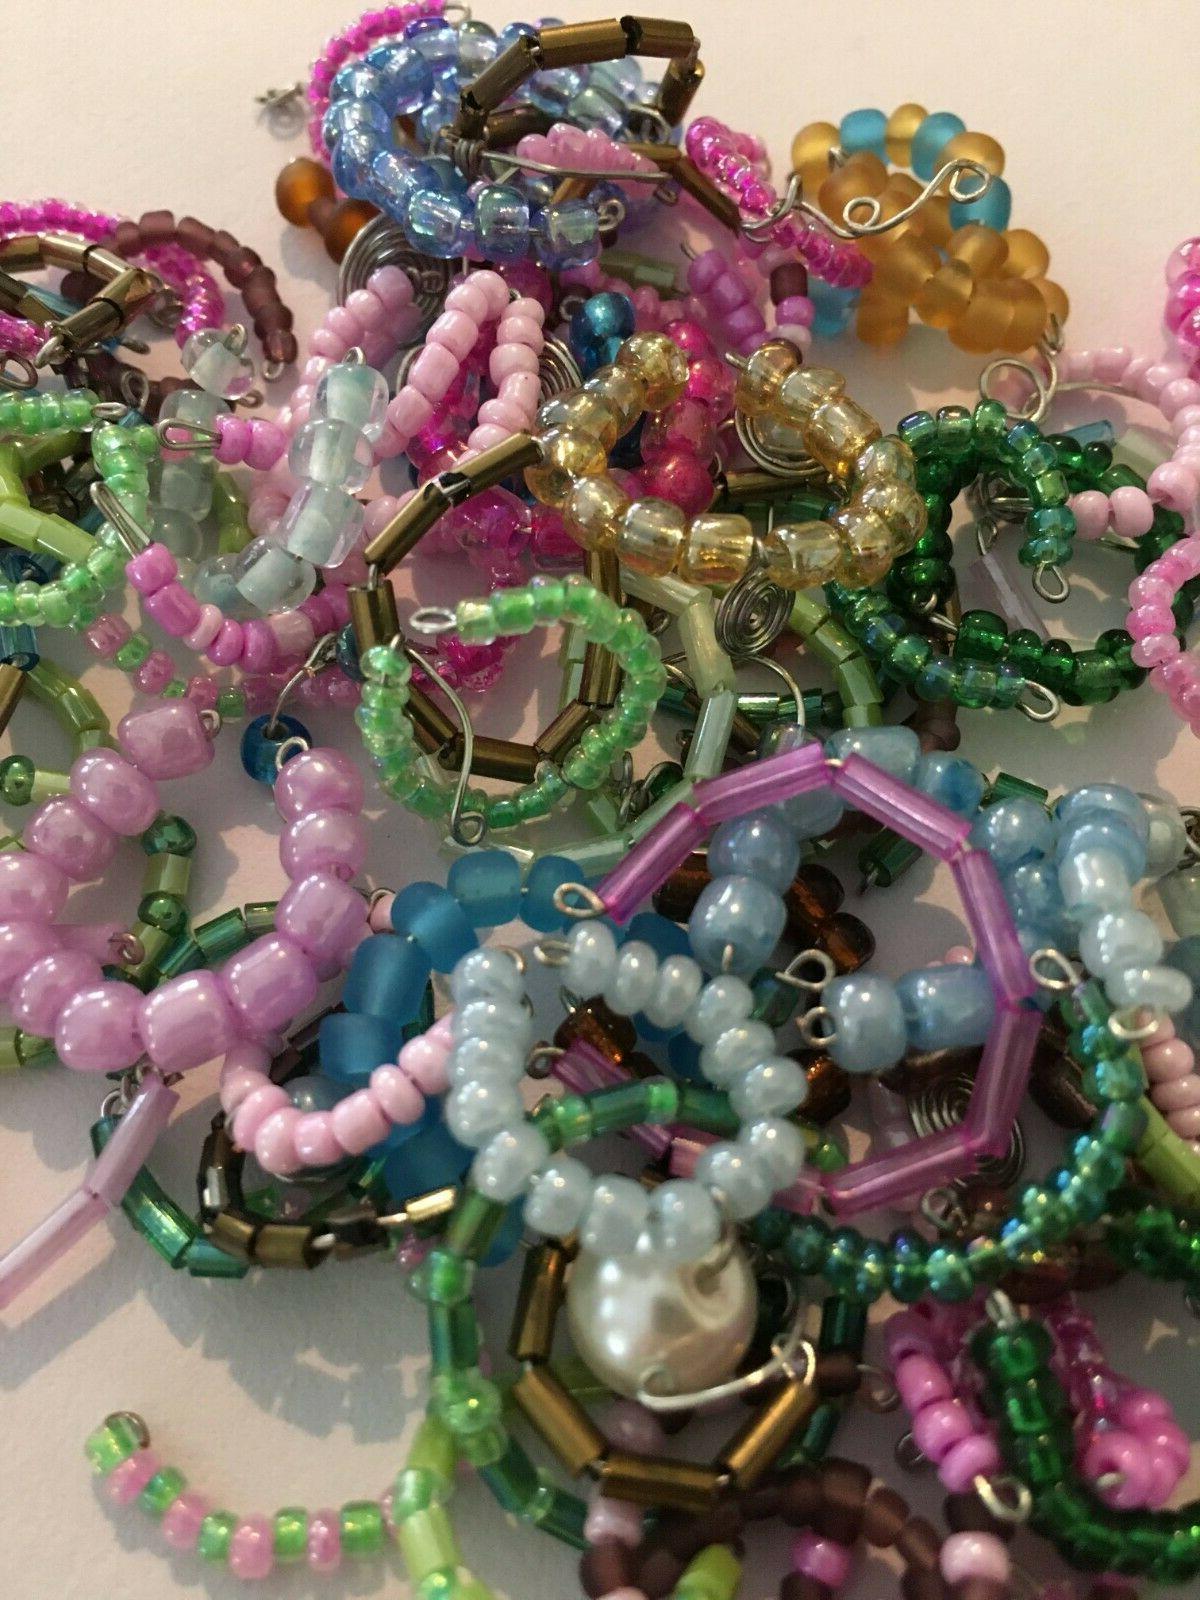 Littlest Pet 10 Piece Handmade Necklaces/Collars